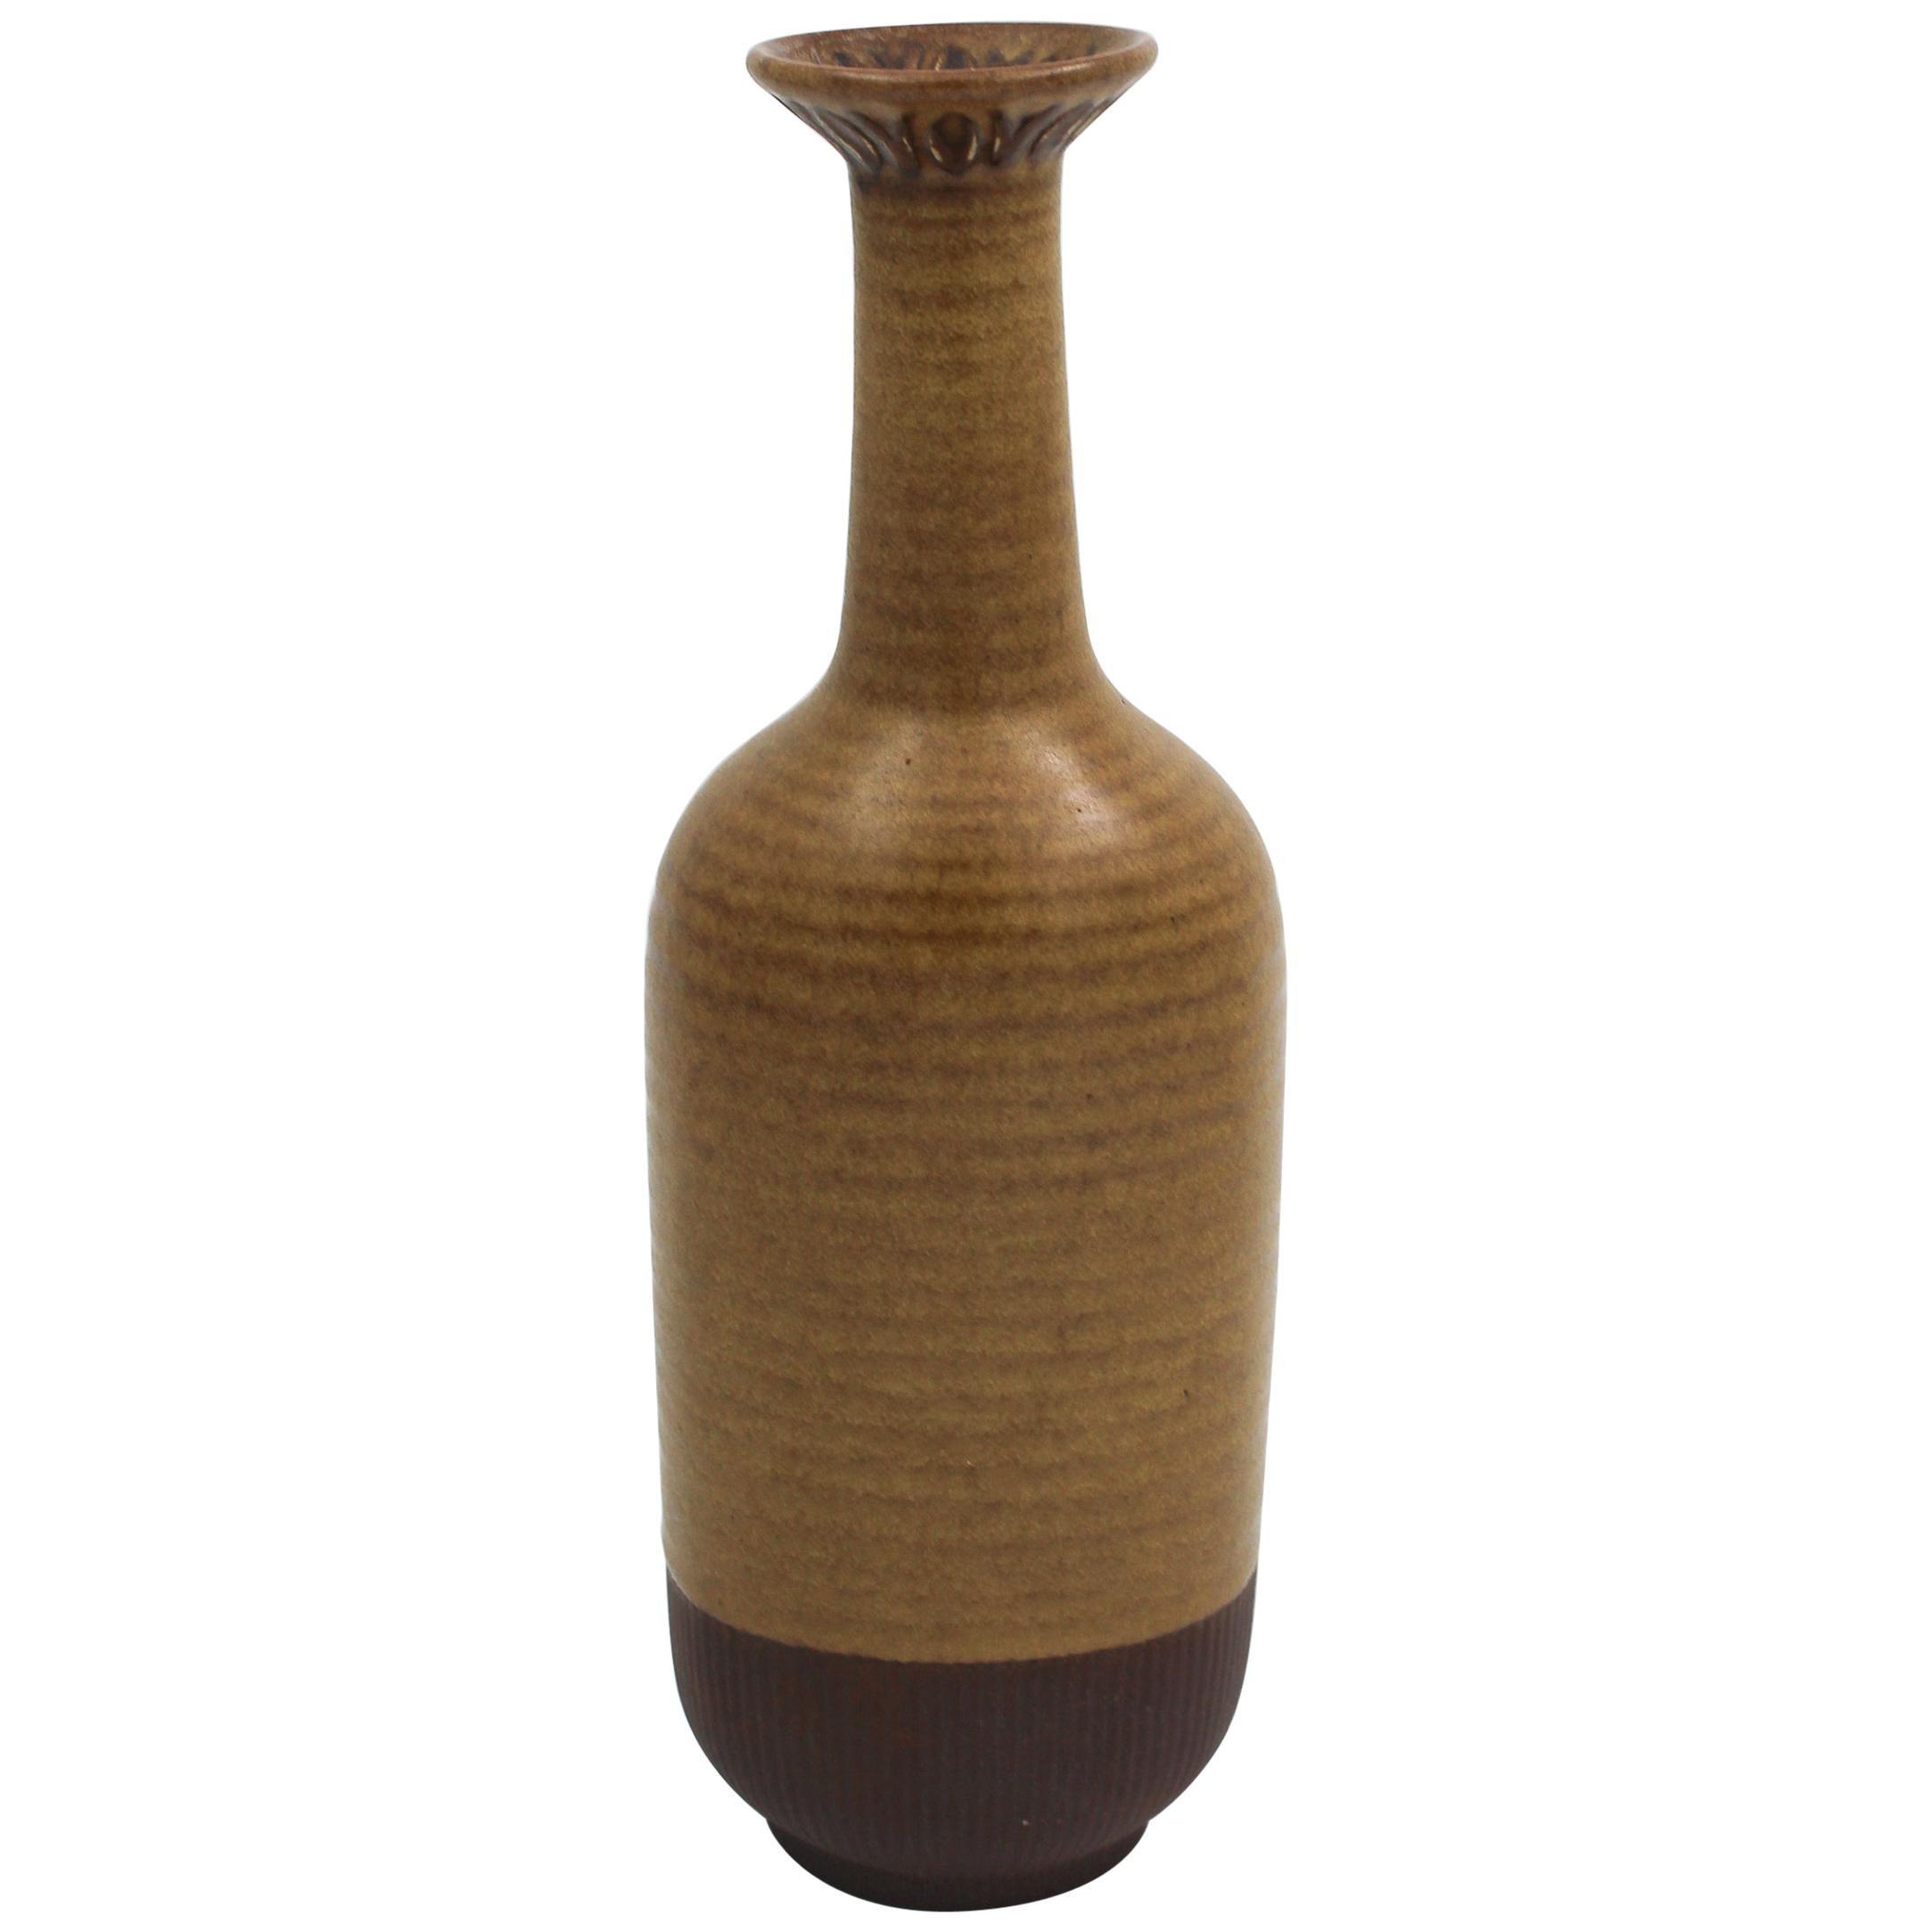 Midcentury Gunnar Nylund Ceramic Vase, 1950s